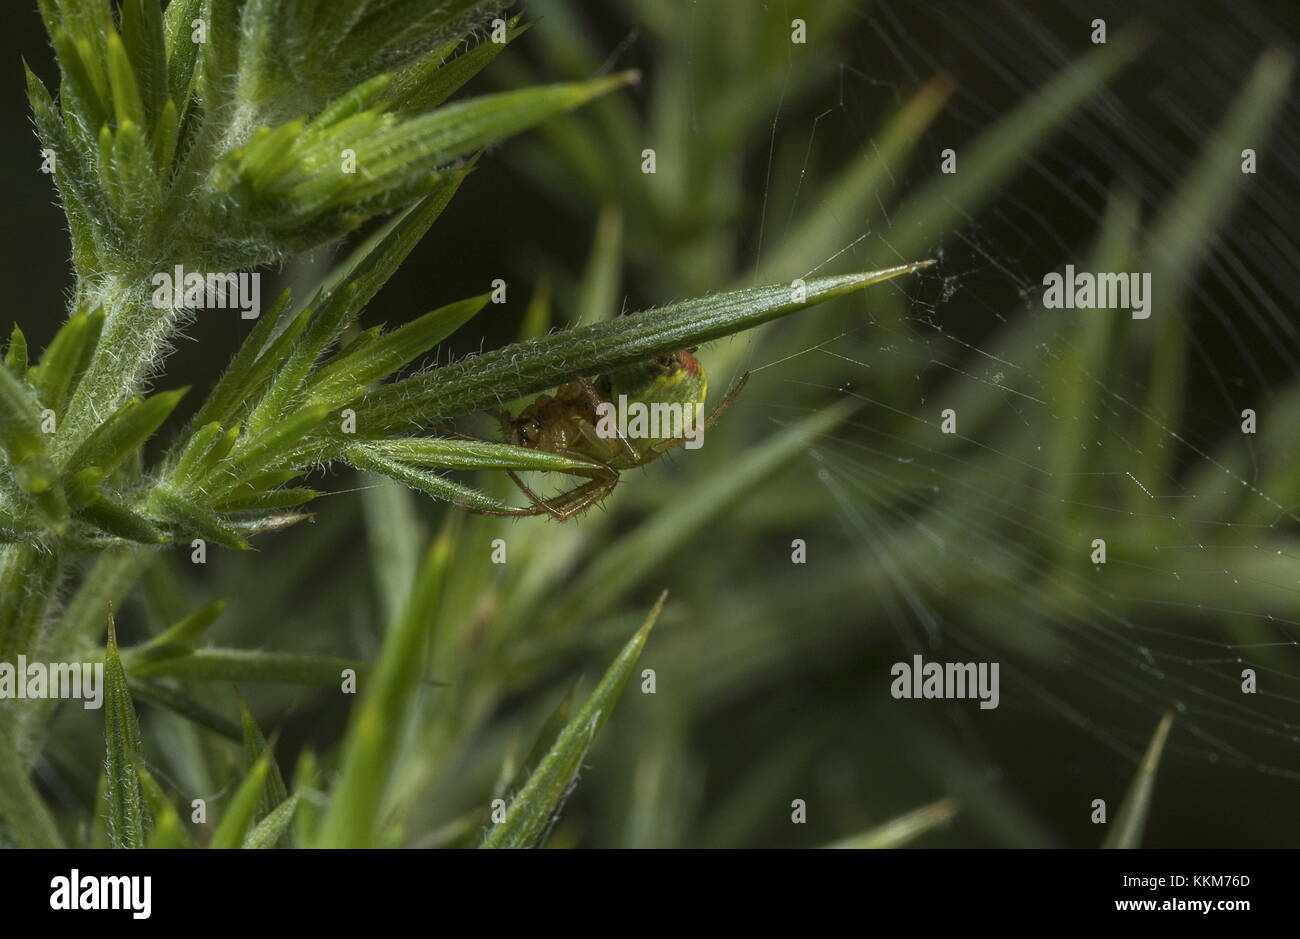 Cucumber green spider, Araniella cucurbitina, on gorse needle. Dorset. - Stock Image